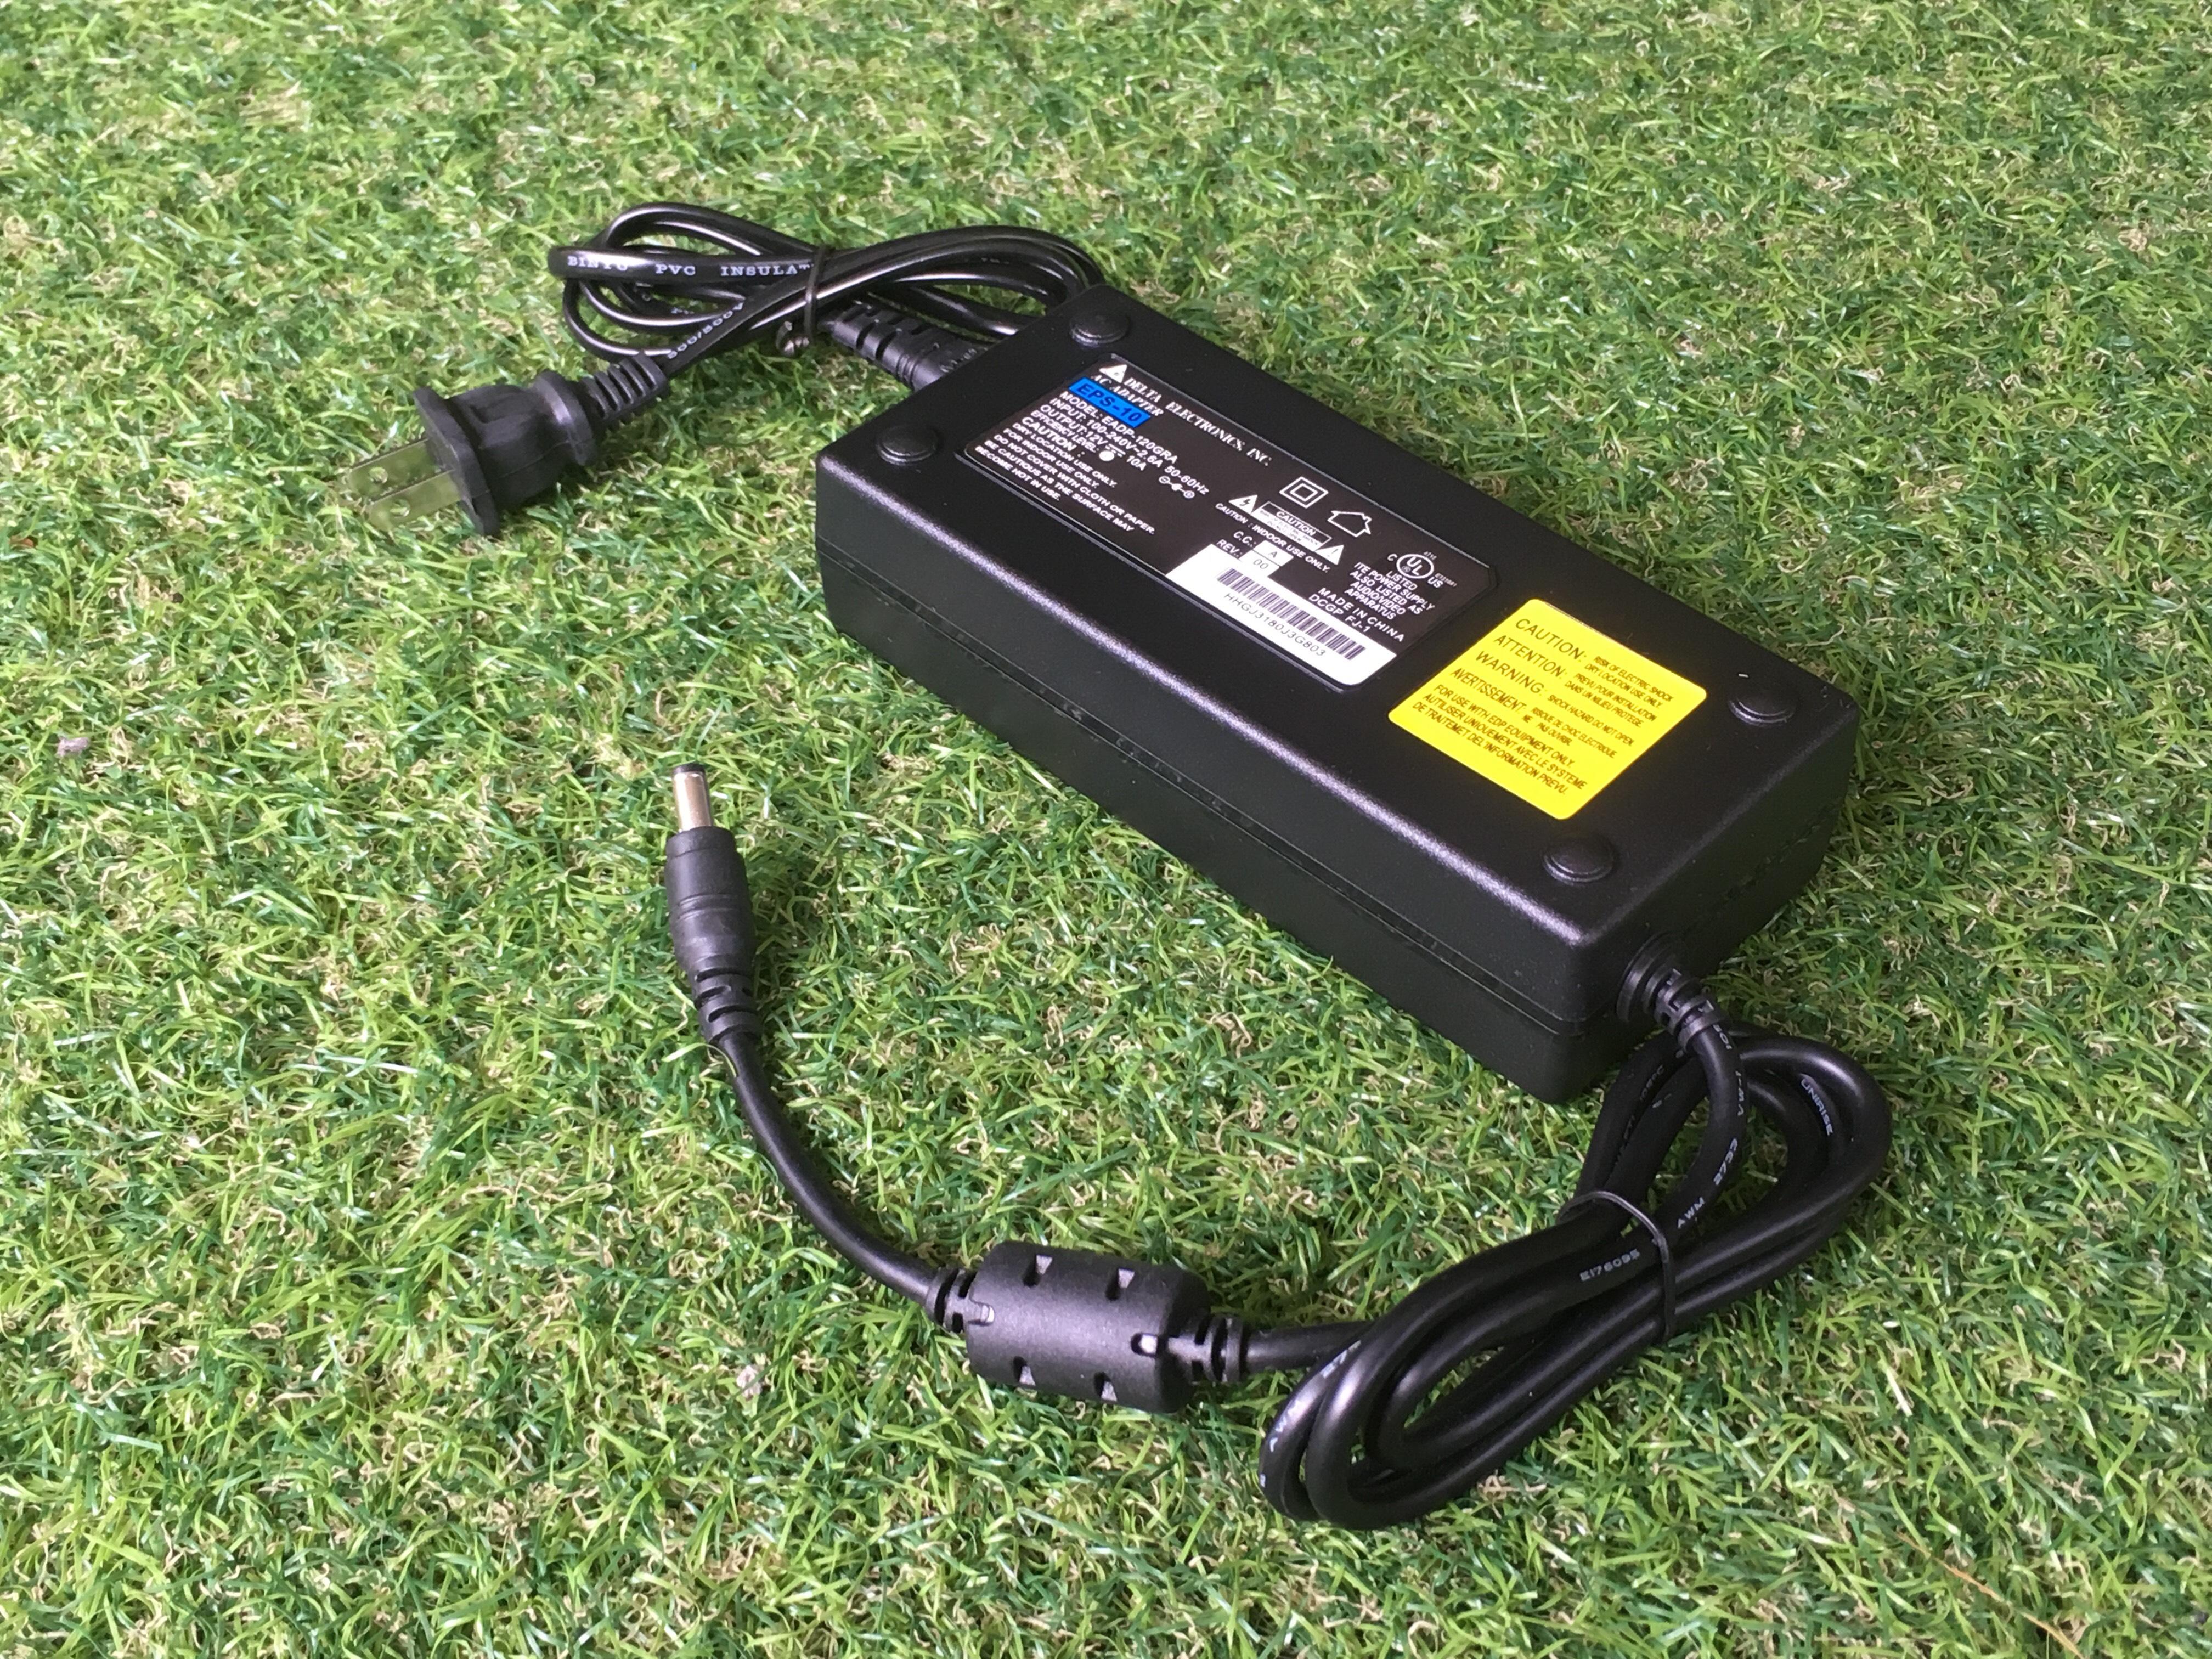 Adapter 12VDC 10A 5.5 mm. x 2.5 mm. รุ่น EADP-120GRA